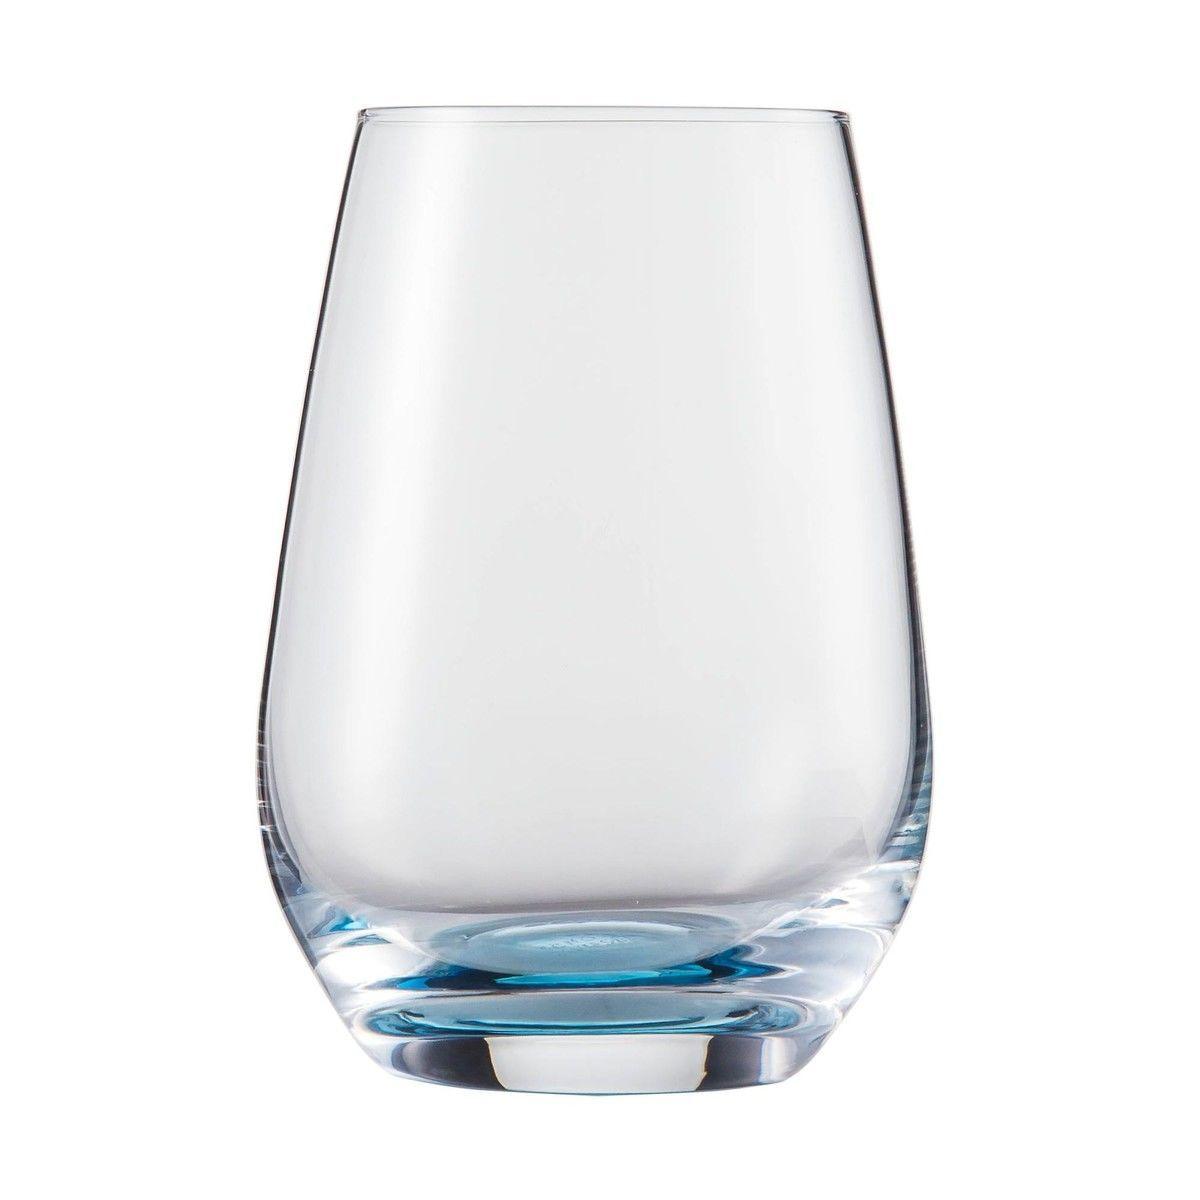 vina touch tumbler glass set of 6 schott zwiesel. Black Bedroom Furniture Sets. Home Design Ideas